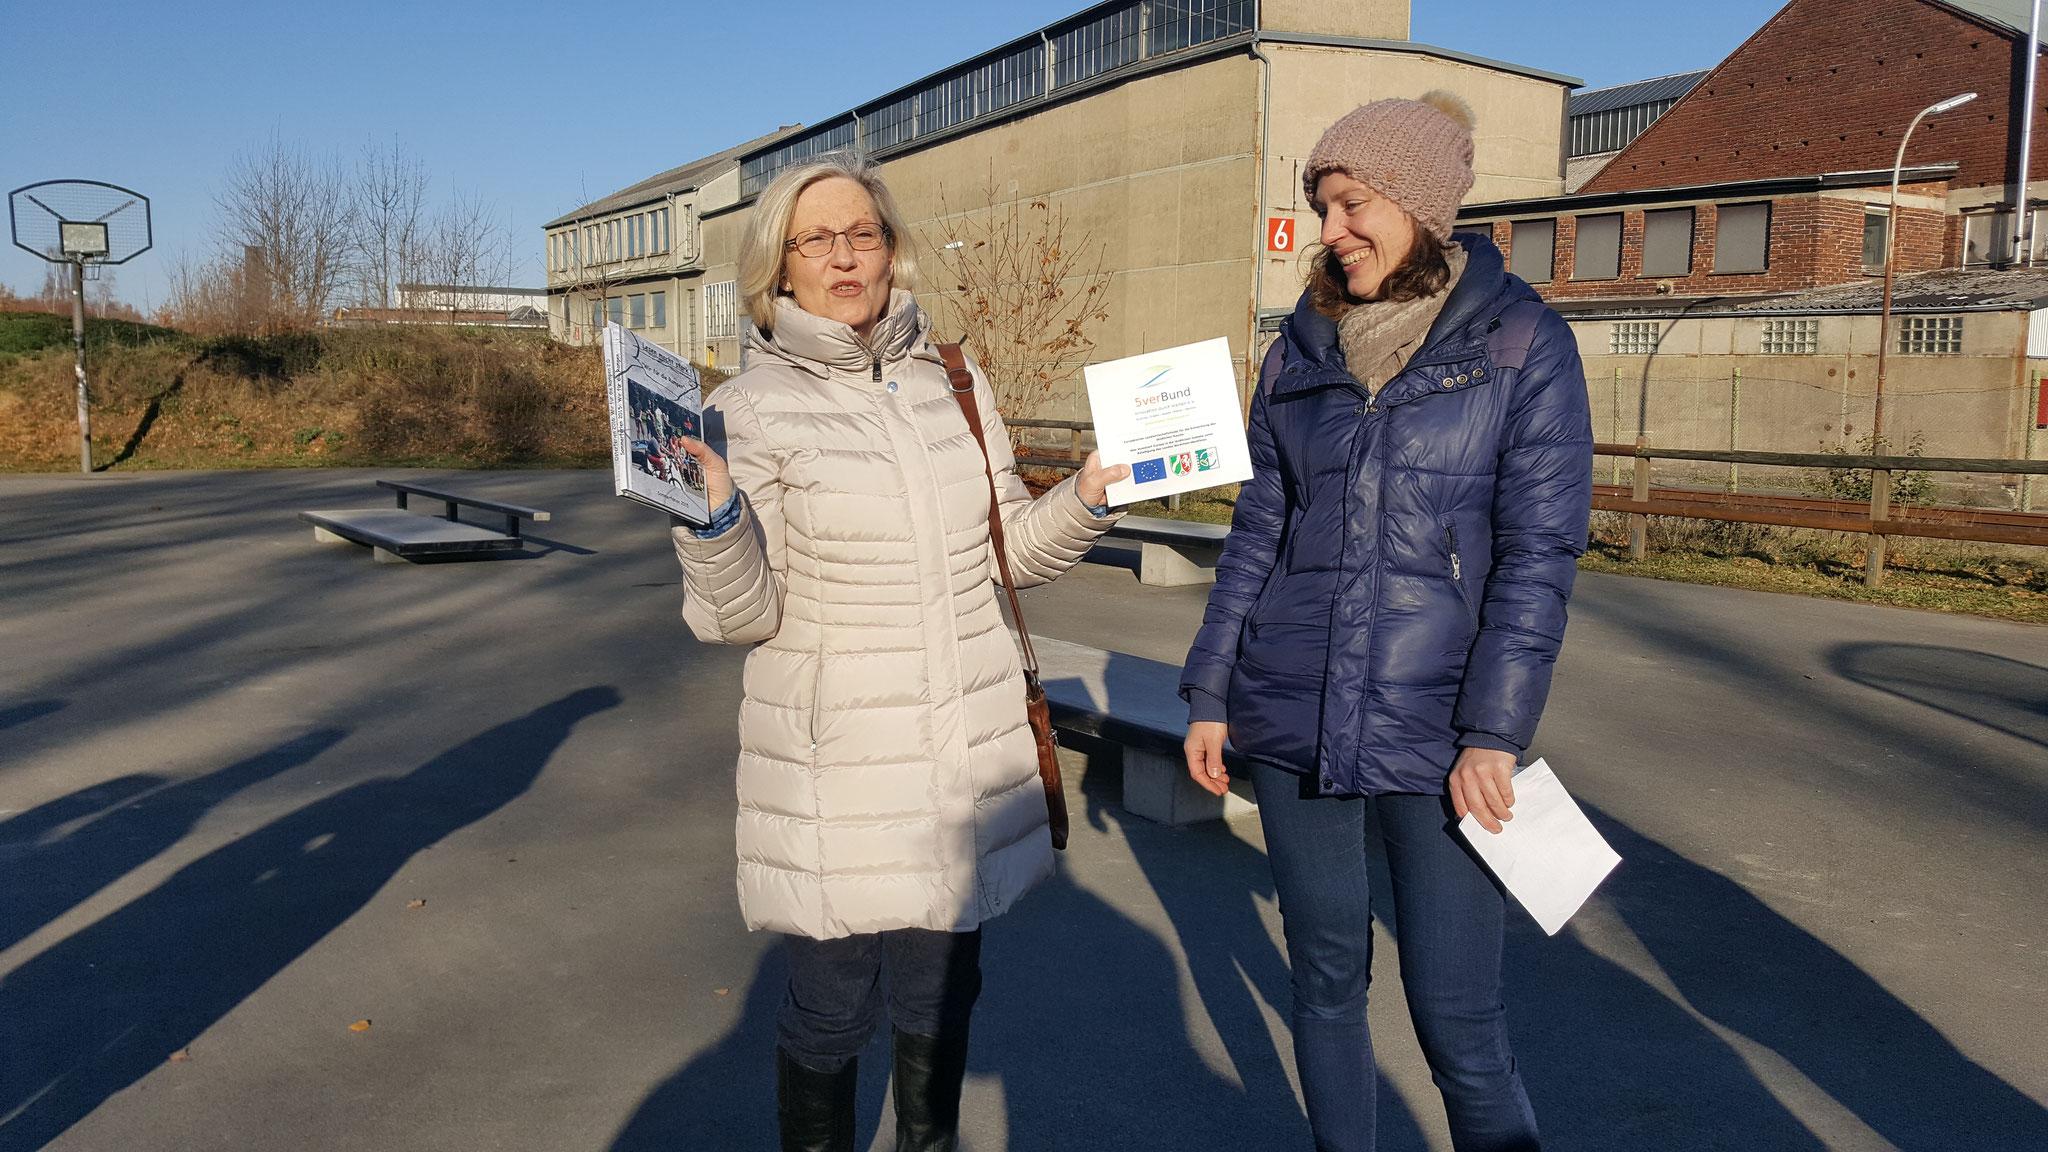 Elke Bertling präsentiert die Fördertafel